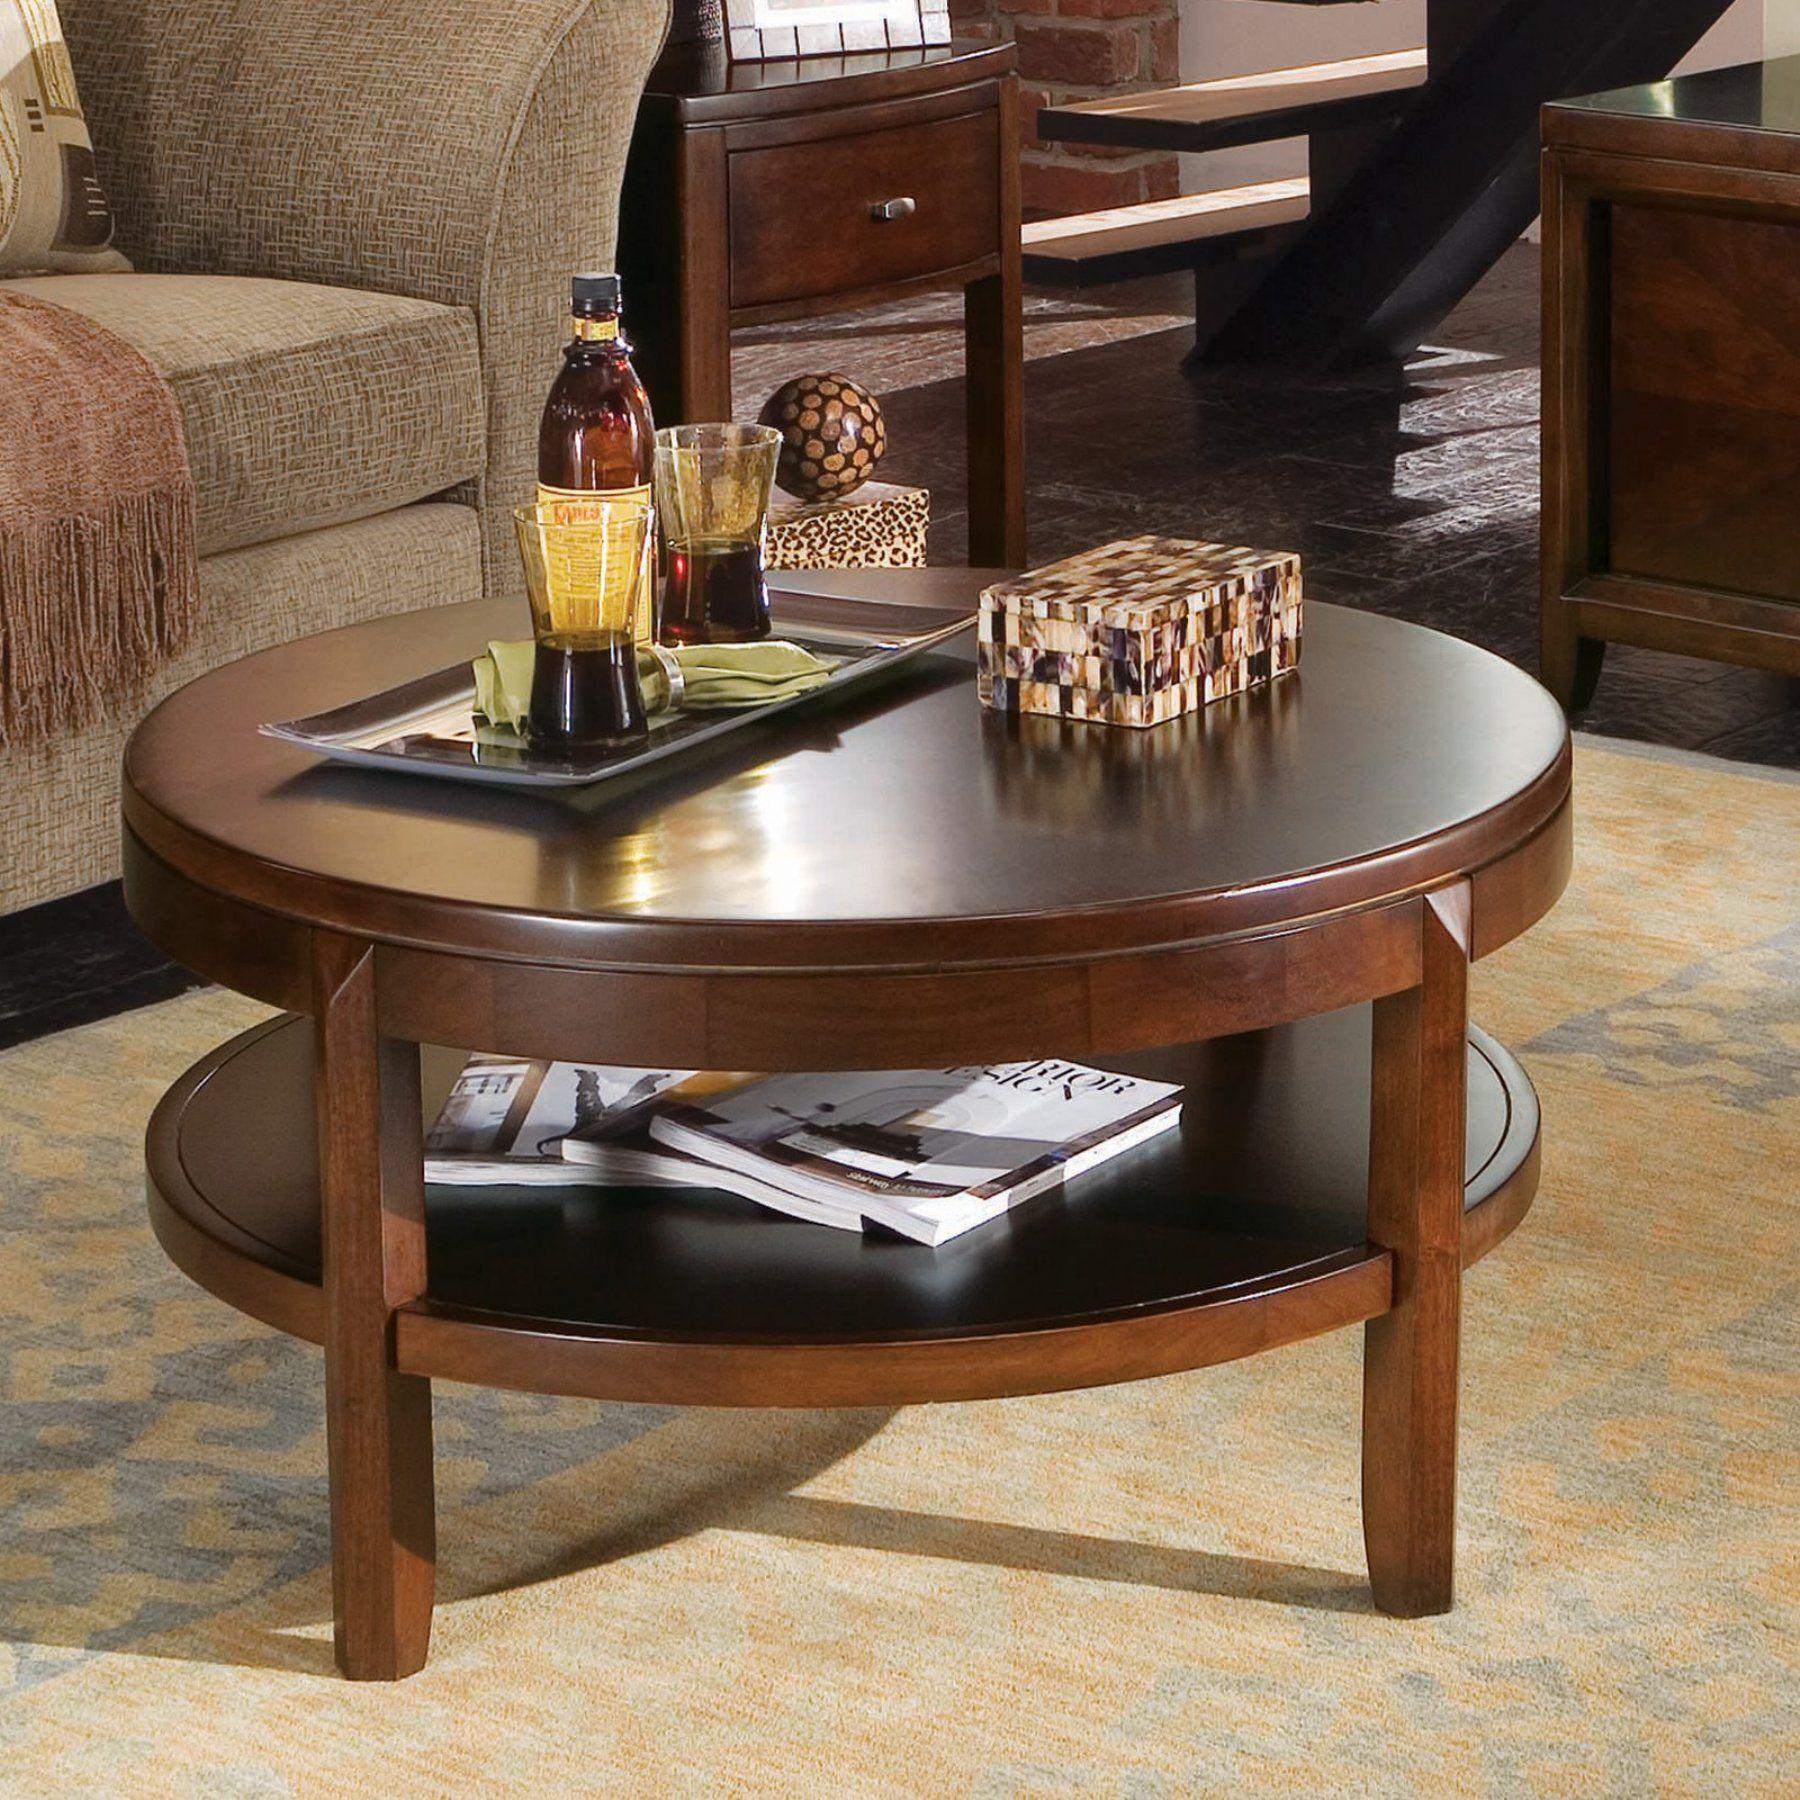 American Drew Tribecca Round Coffee Table 912 913 Round Coffee Table Sets Coffee Table Round Coffee Table [ 1800 x 1800 Pixel ]